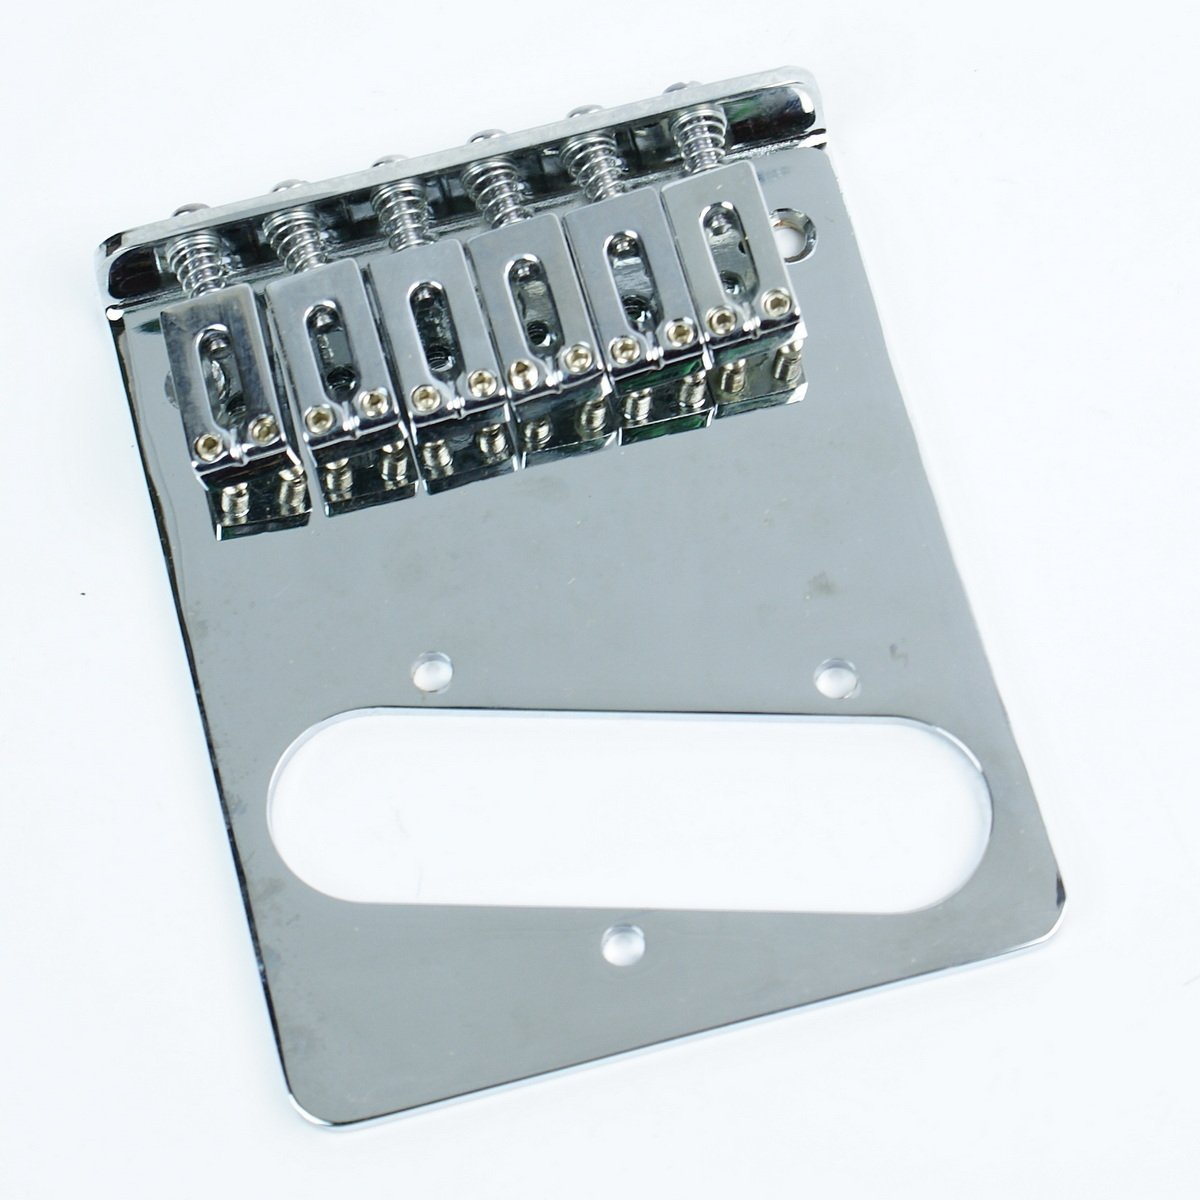 (B97) Replacement Tele Telecaster Guitar bridge ,6-Saddle Modern Style ,Chrome mLaval mLa-0407